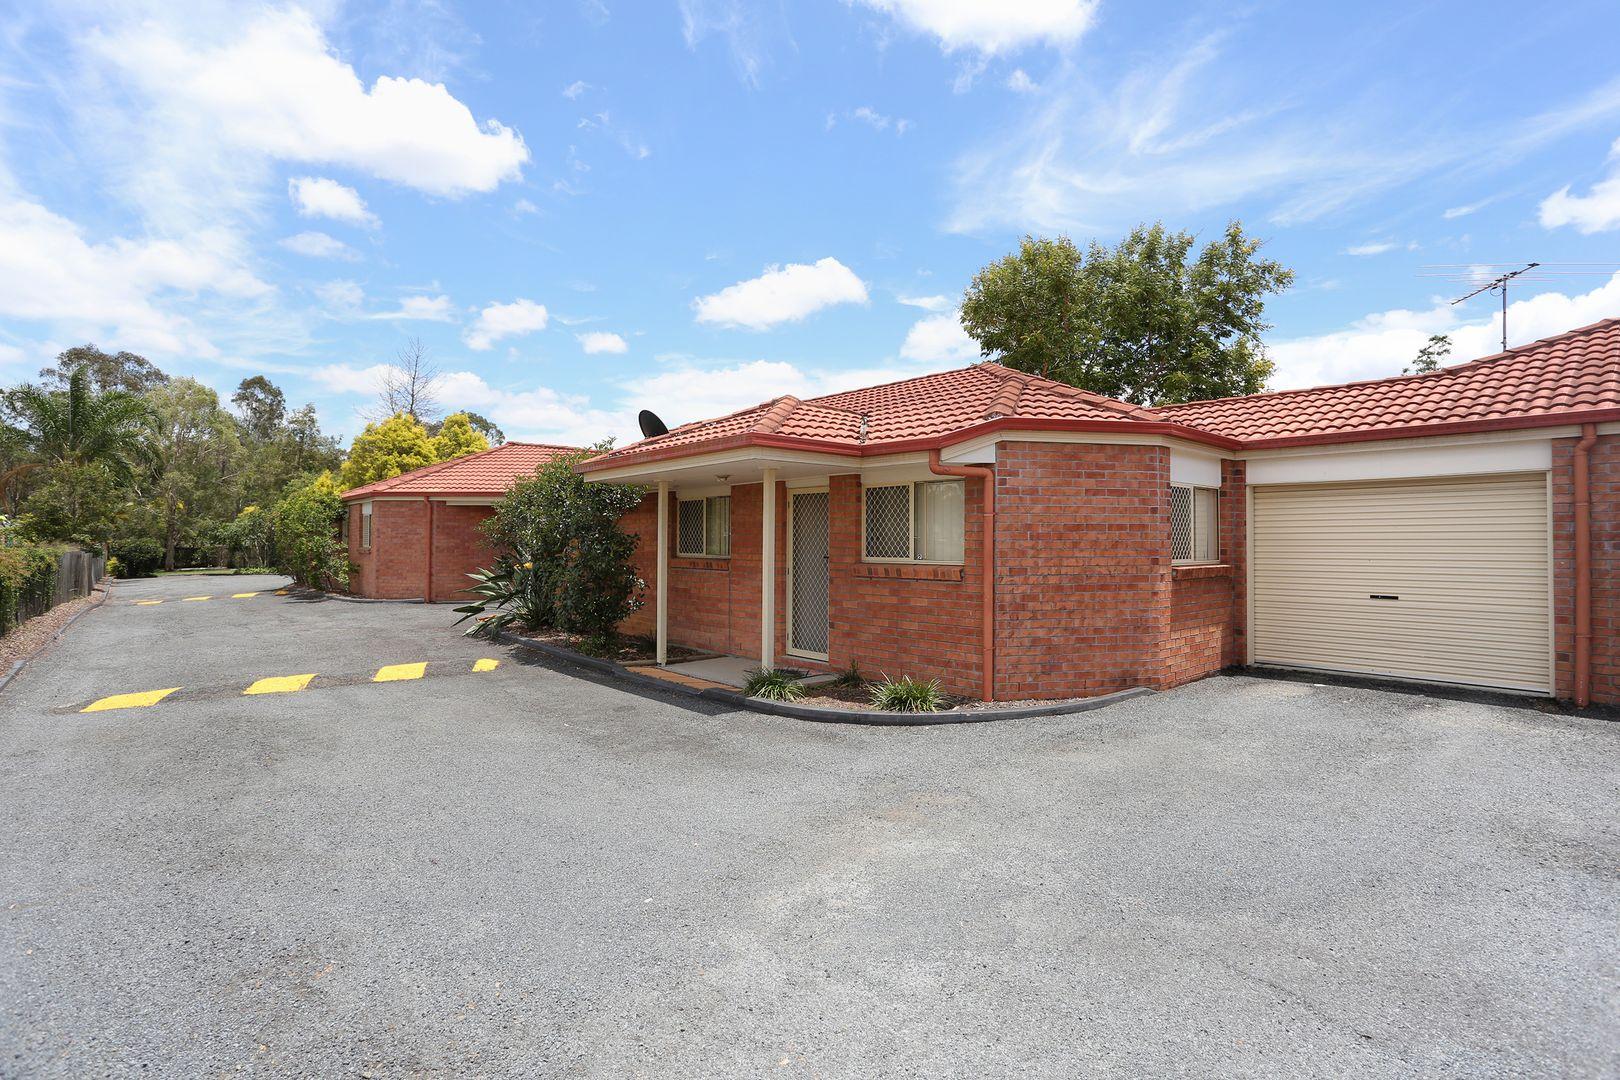 12/175 Haig Road, Loganlea QLD 4131, Image 2